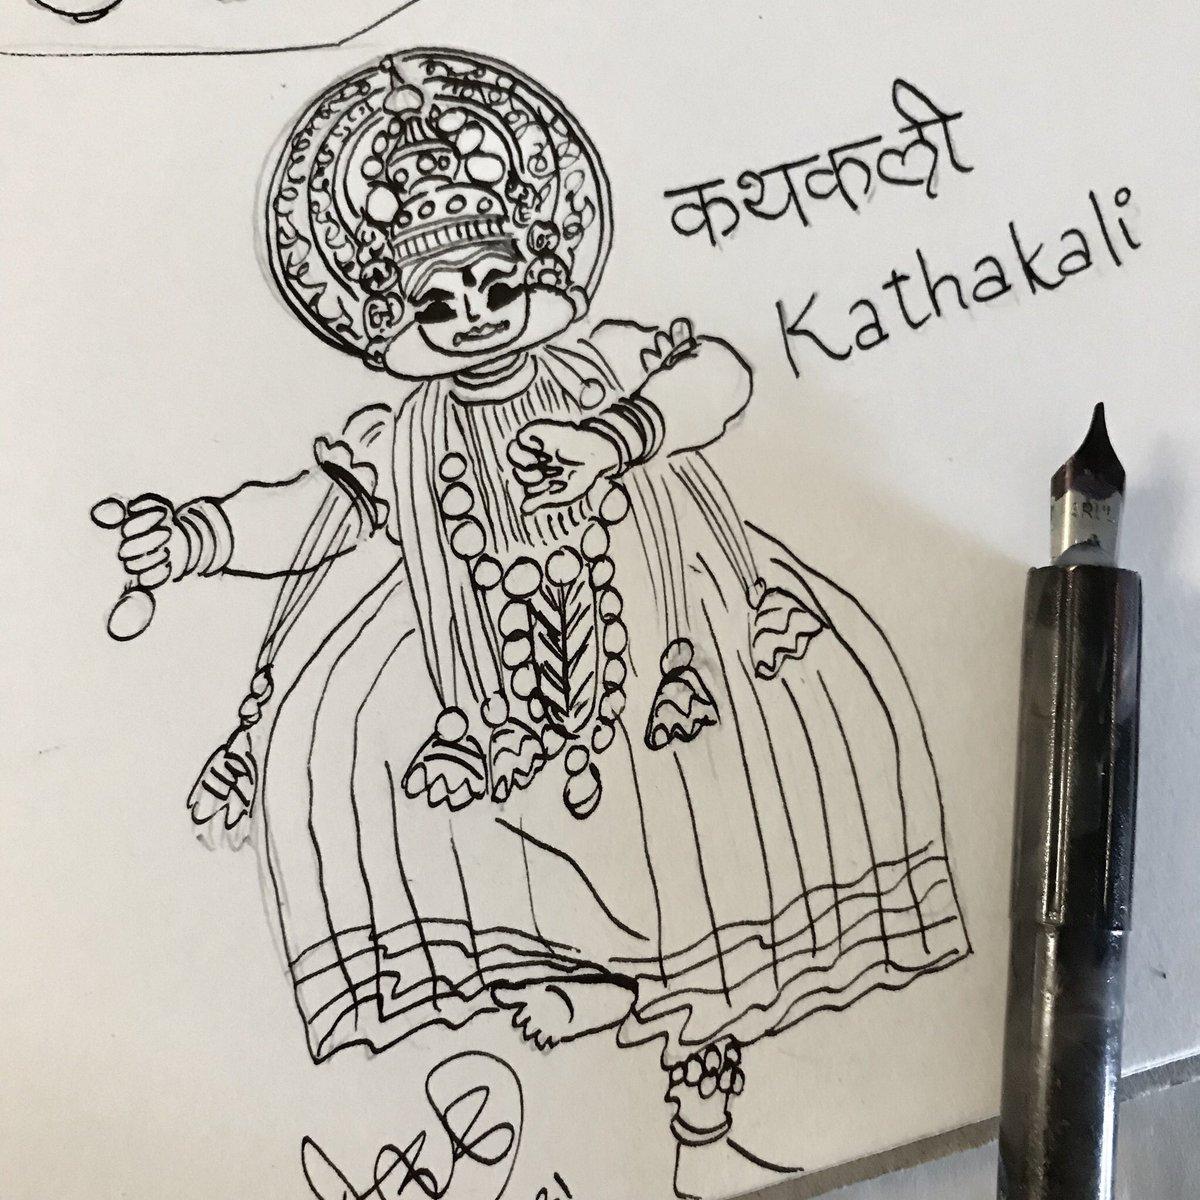 Devika Joglekar On Twitter Kathakali Inktober17 Inktoberday21 Kathakali Kerala Indian Classical Dance Ink Sketch Sketchbook Illustration Incredibleindia Https T Co Uu8mslfqxx